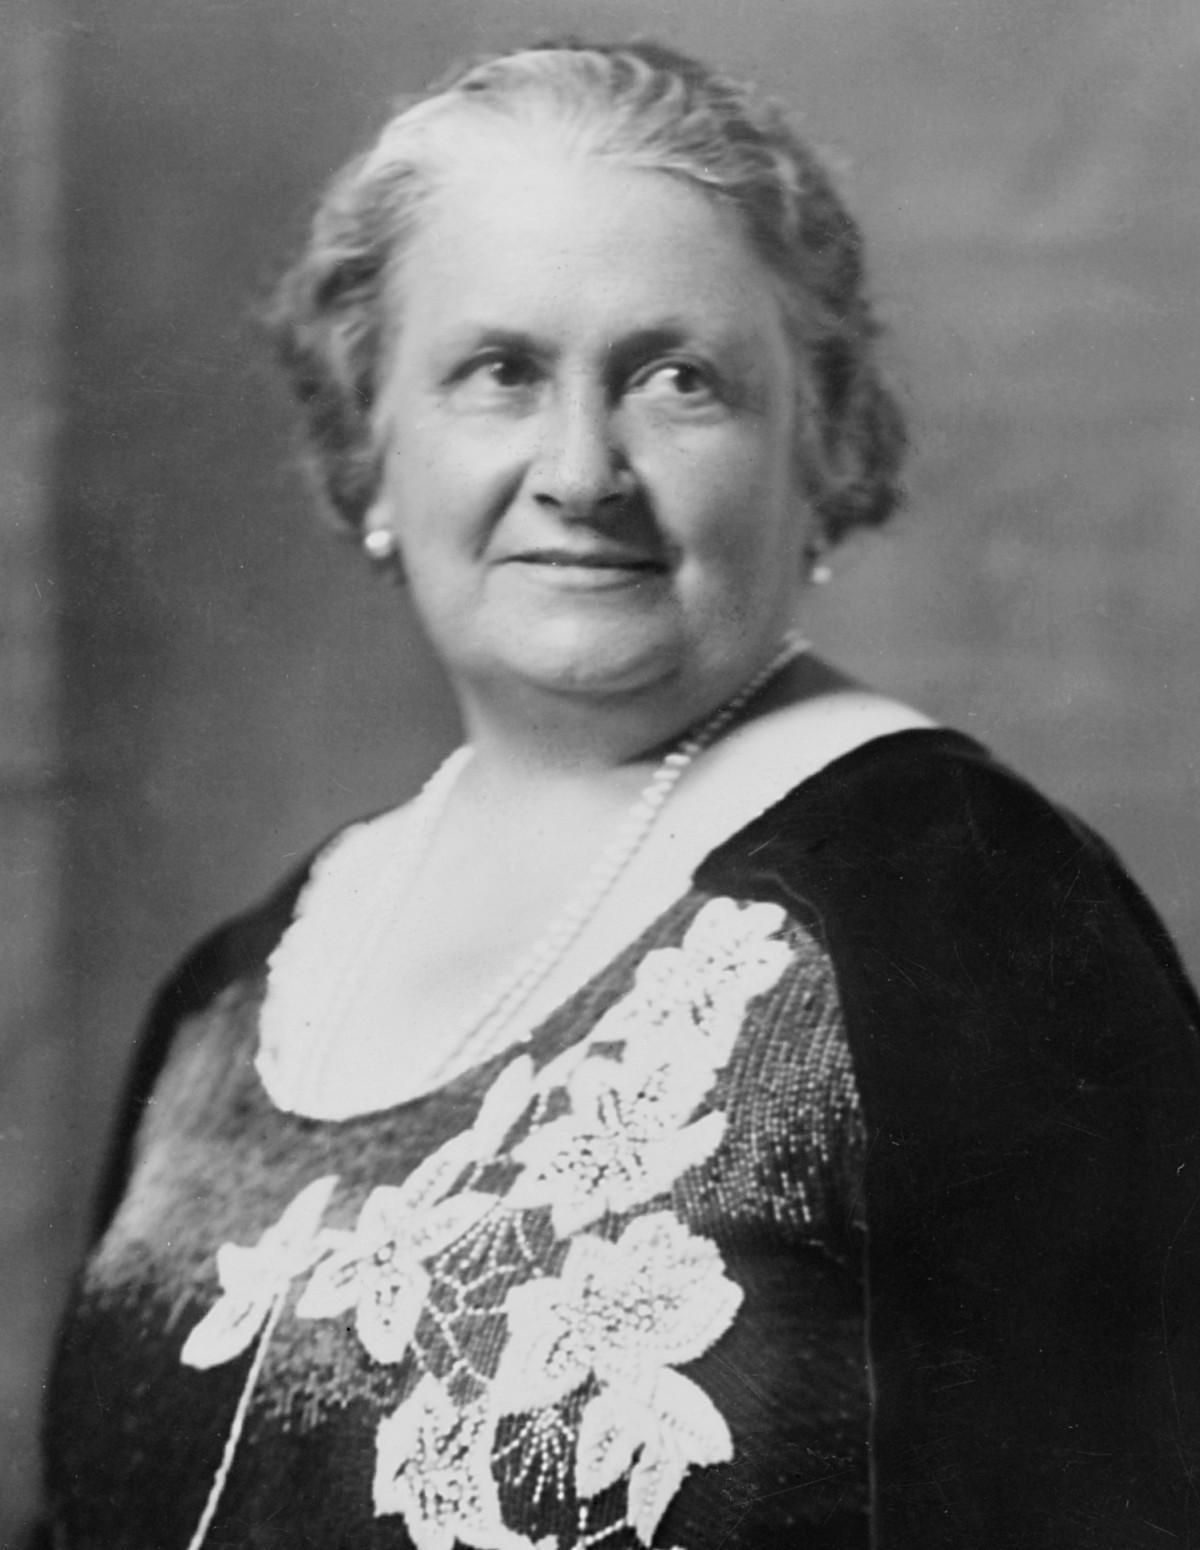 Maria Montessori, italyan e�itimci (�Y-1952) tarihte bug�n